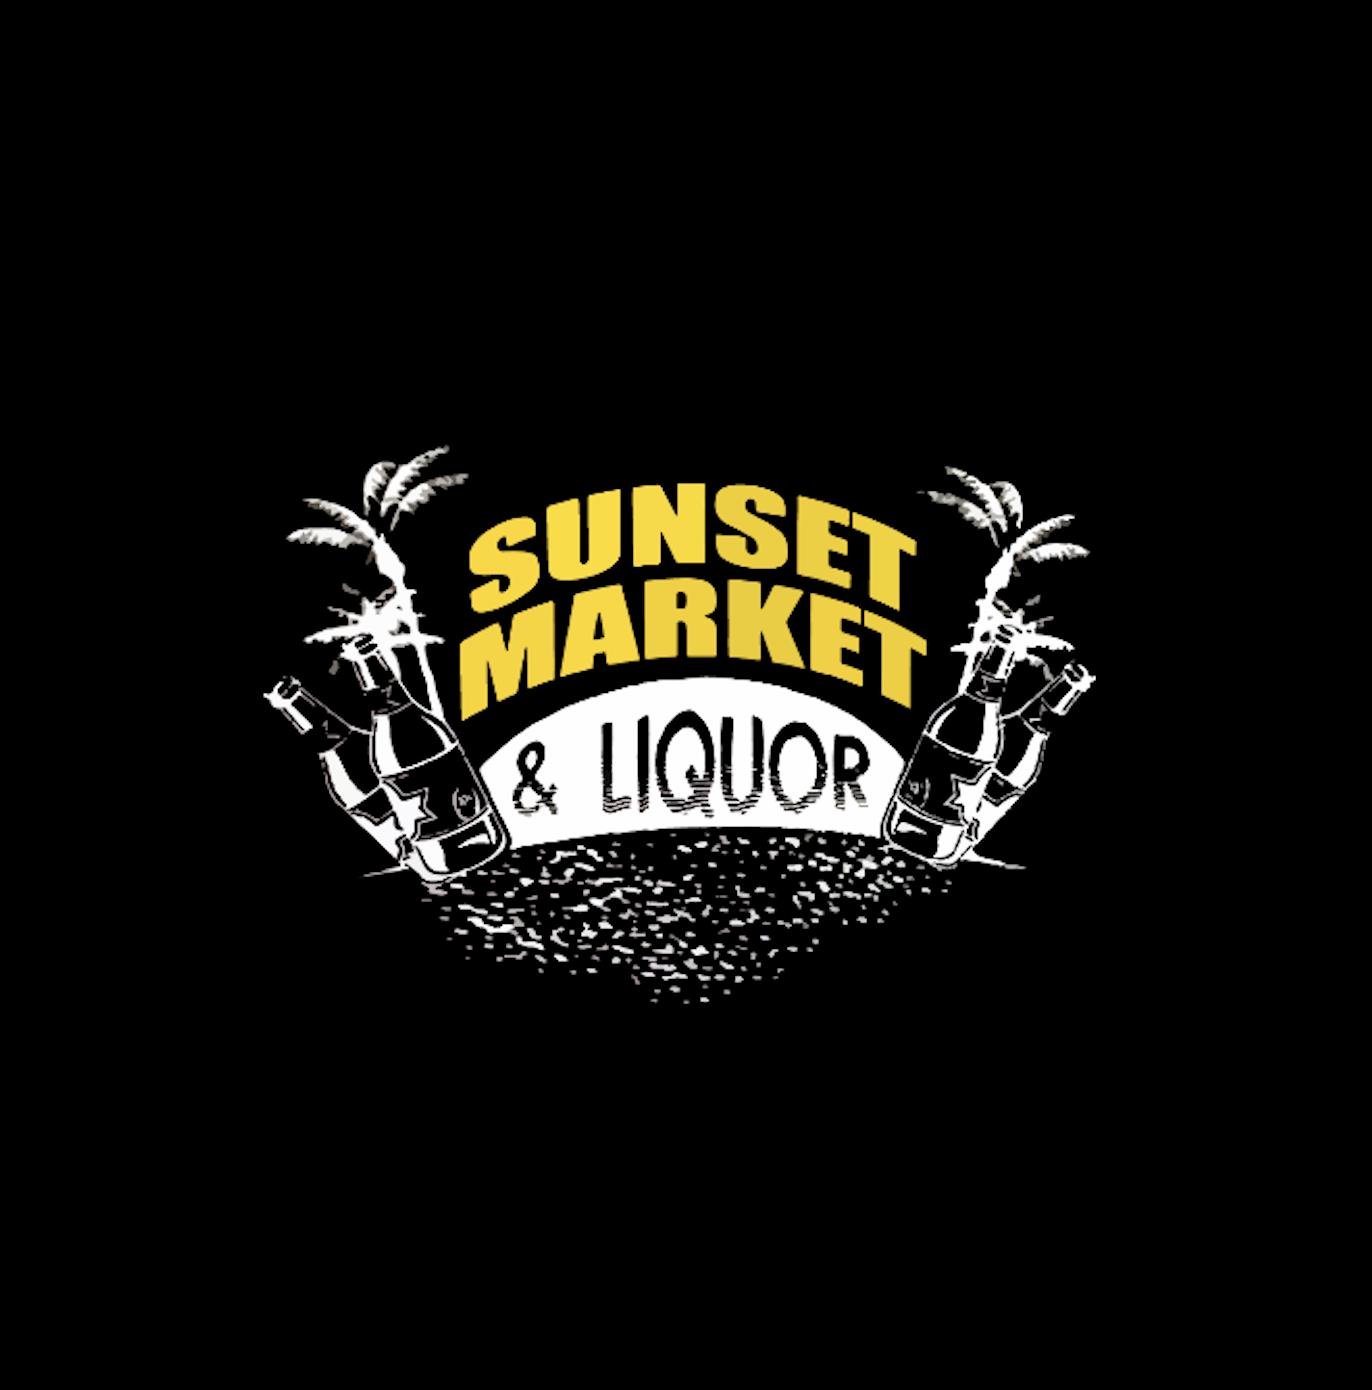 Sunset Market & Liquor logo